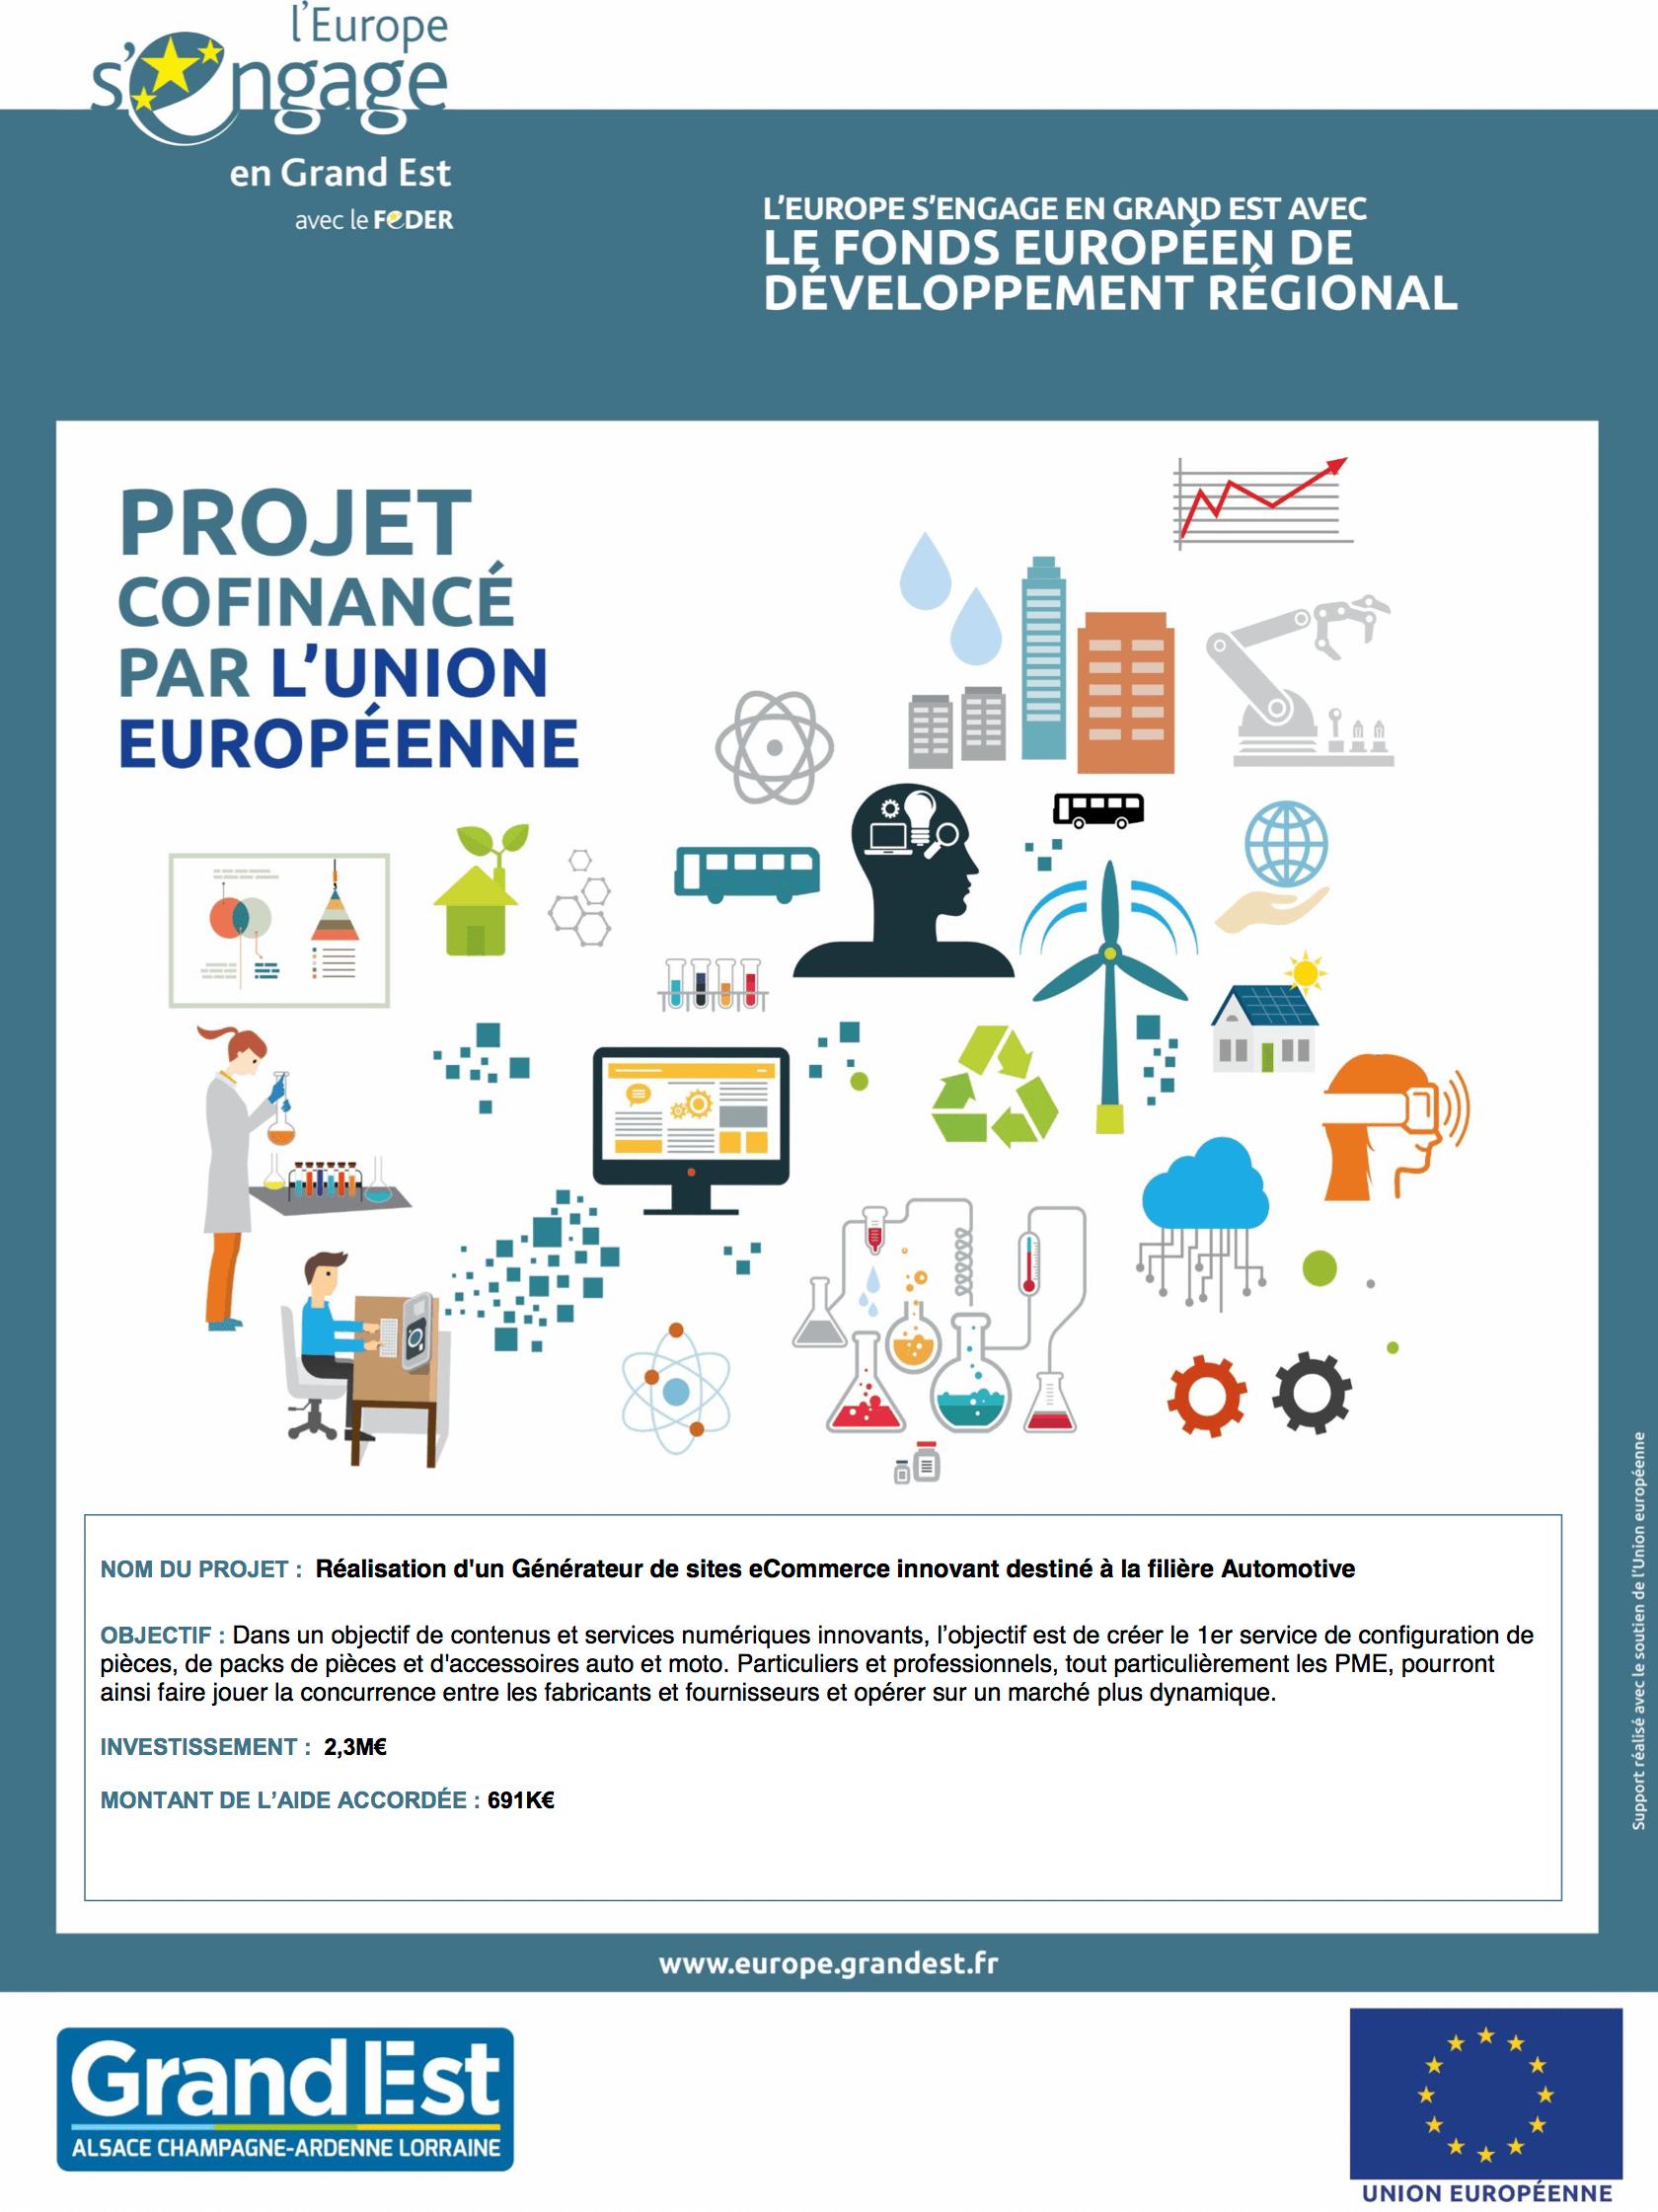 Fond européen de développement local